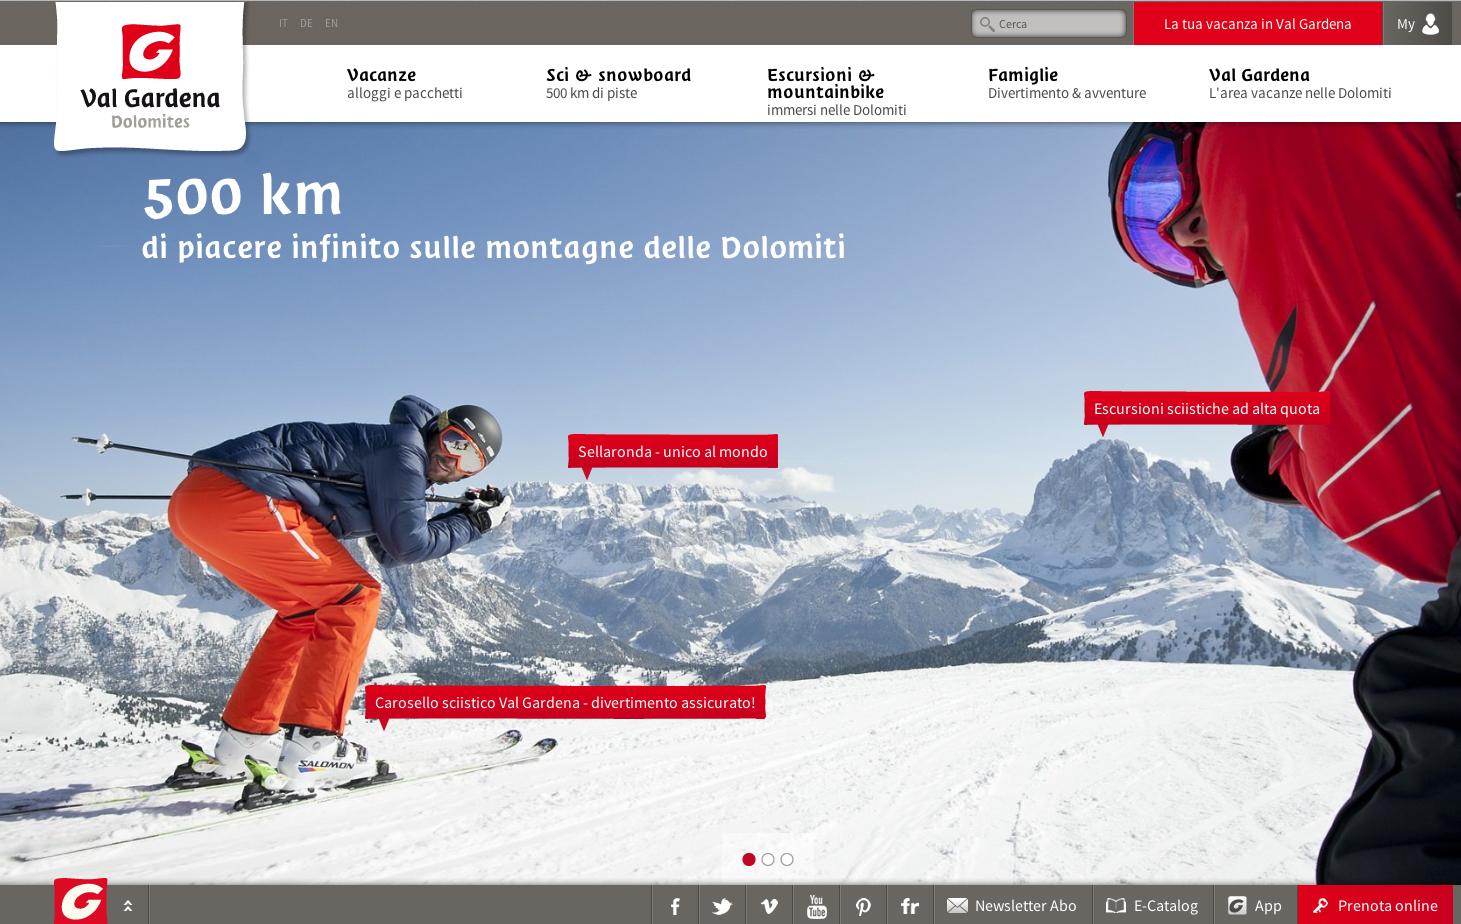 Val Gardena: online il nuovo sito valgardena.it